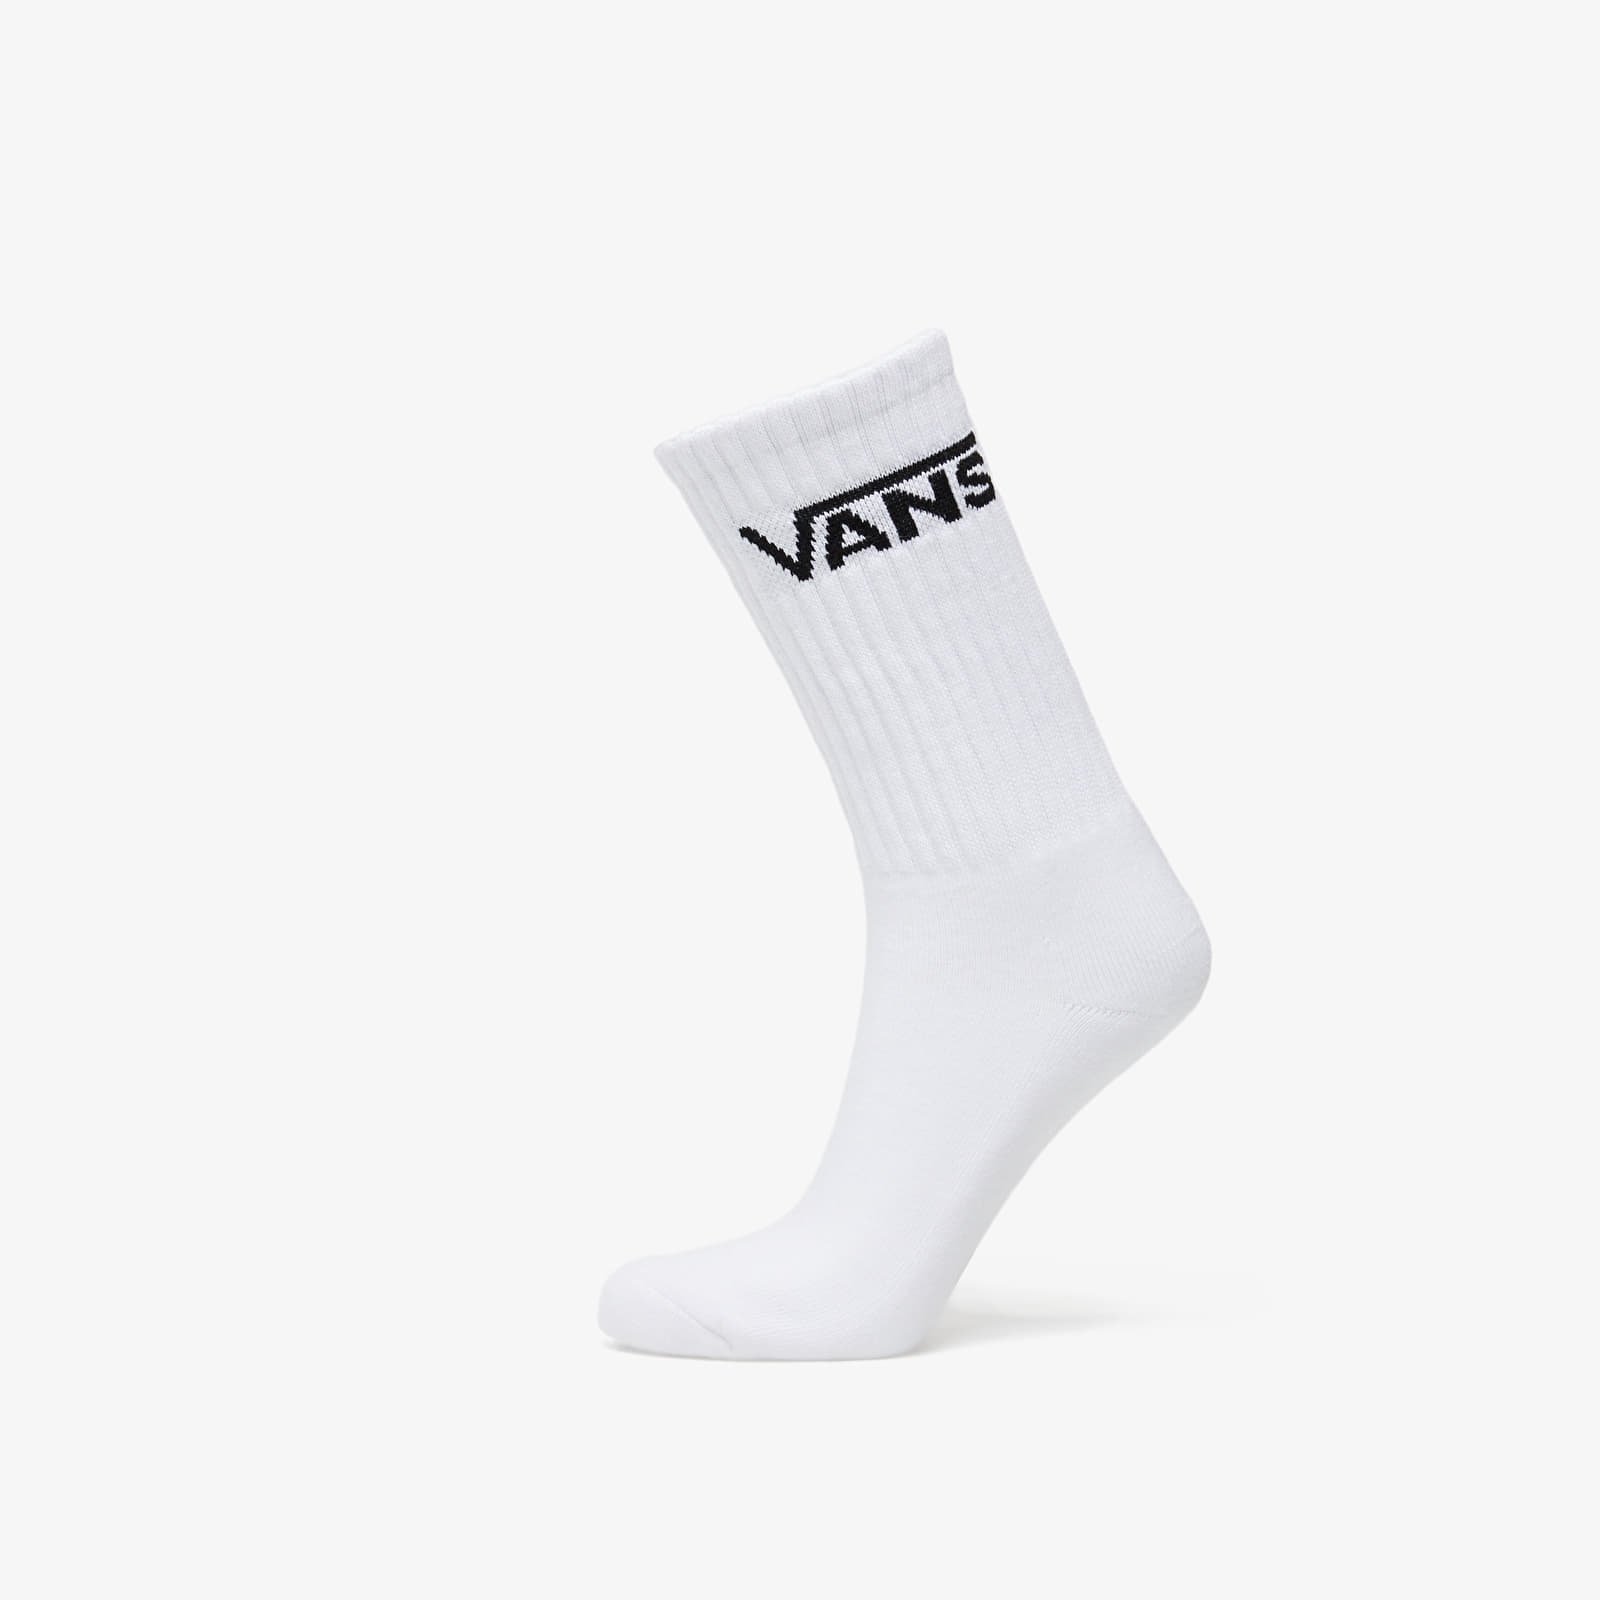 Vans Classic Crew Socks 3Pack Black/ Checkerboard 42.5-47